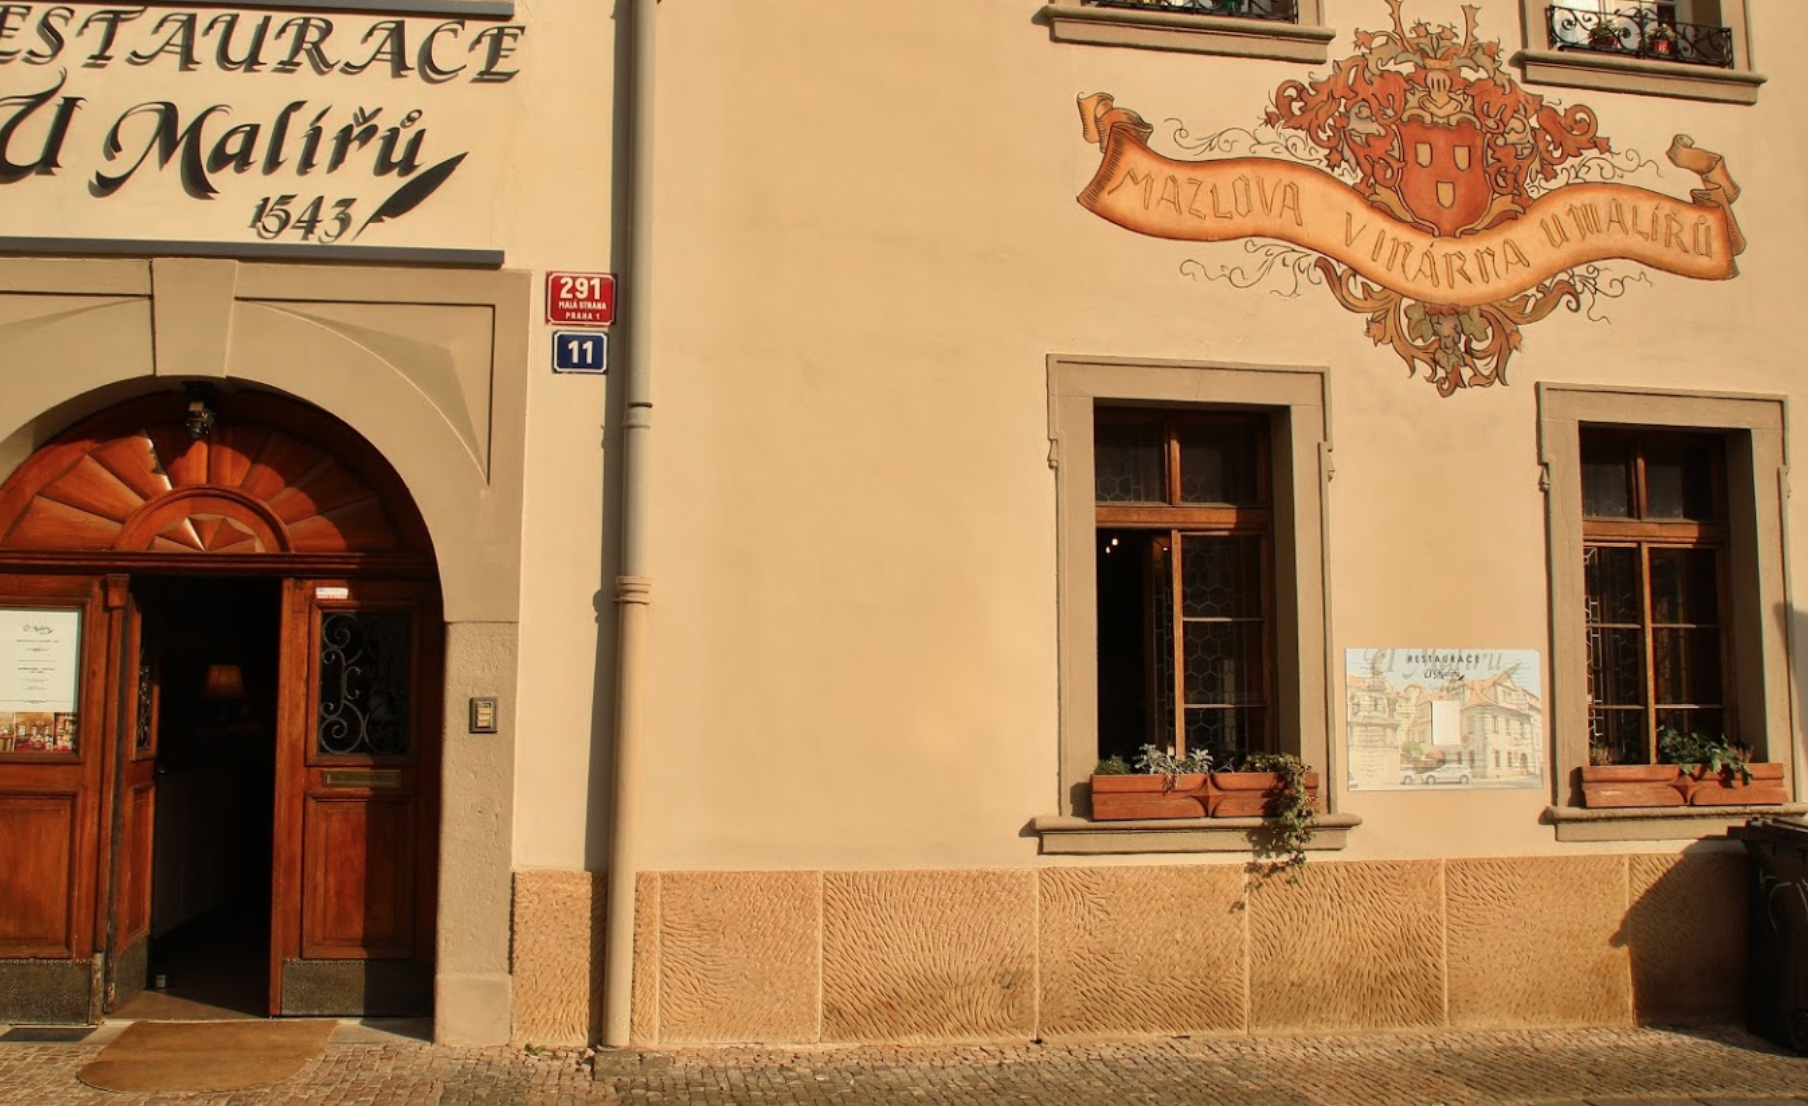 Ресторан U Maliru 1543